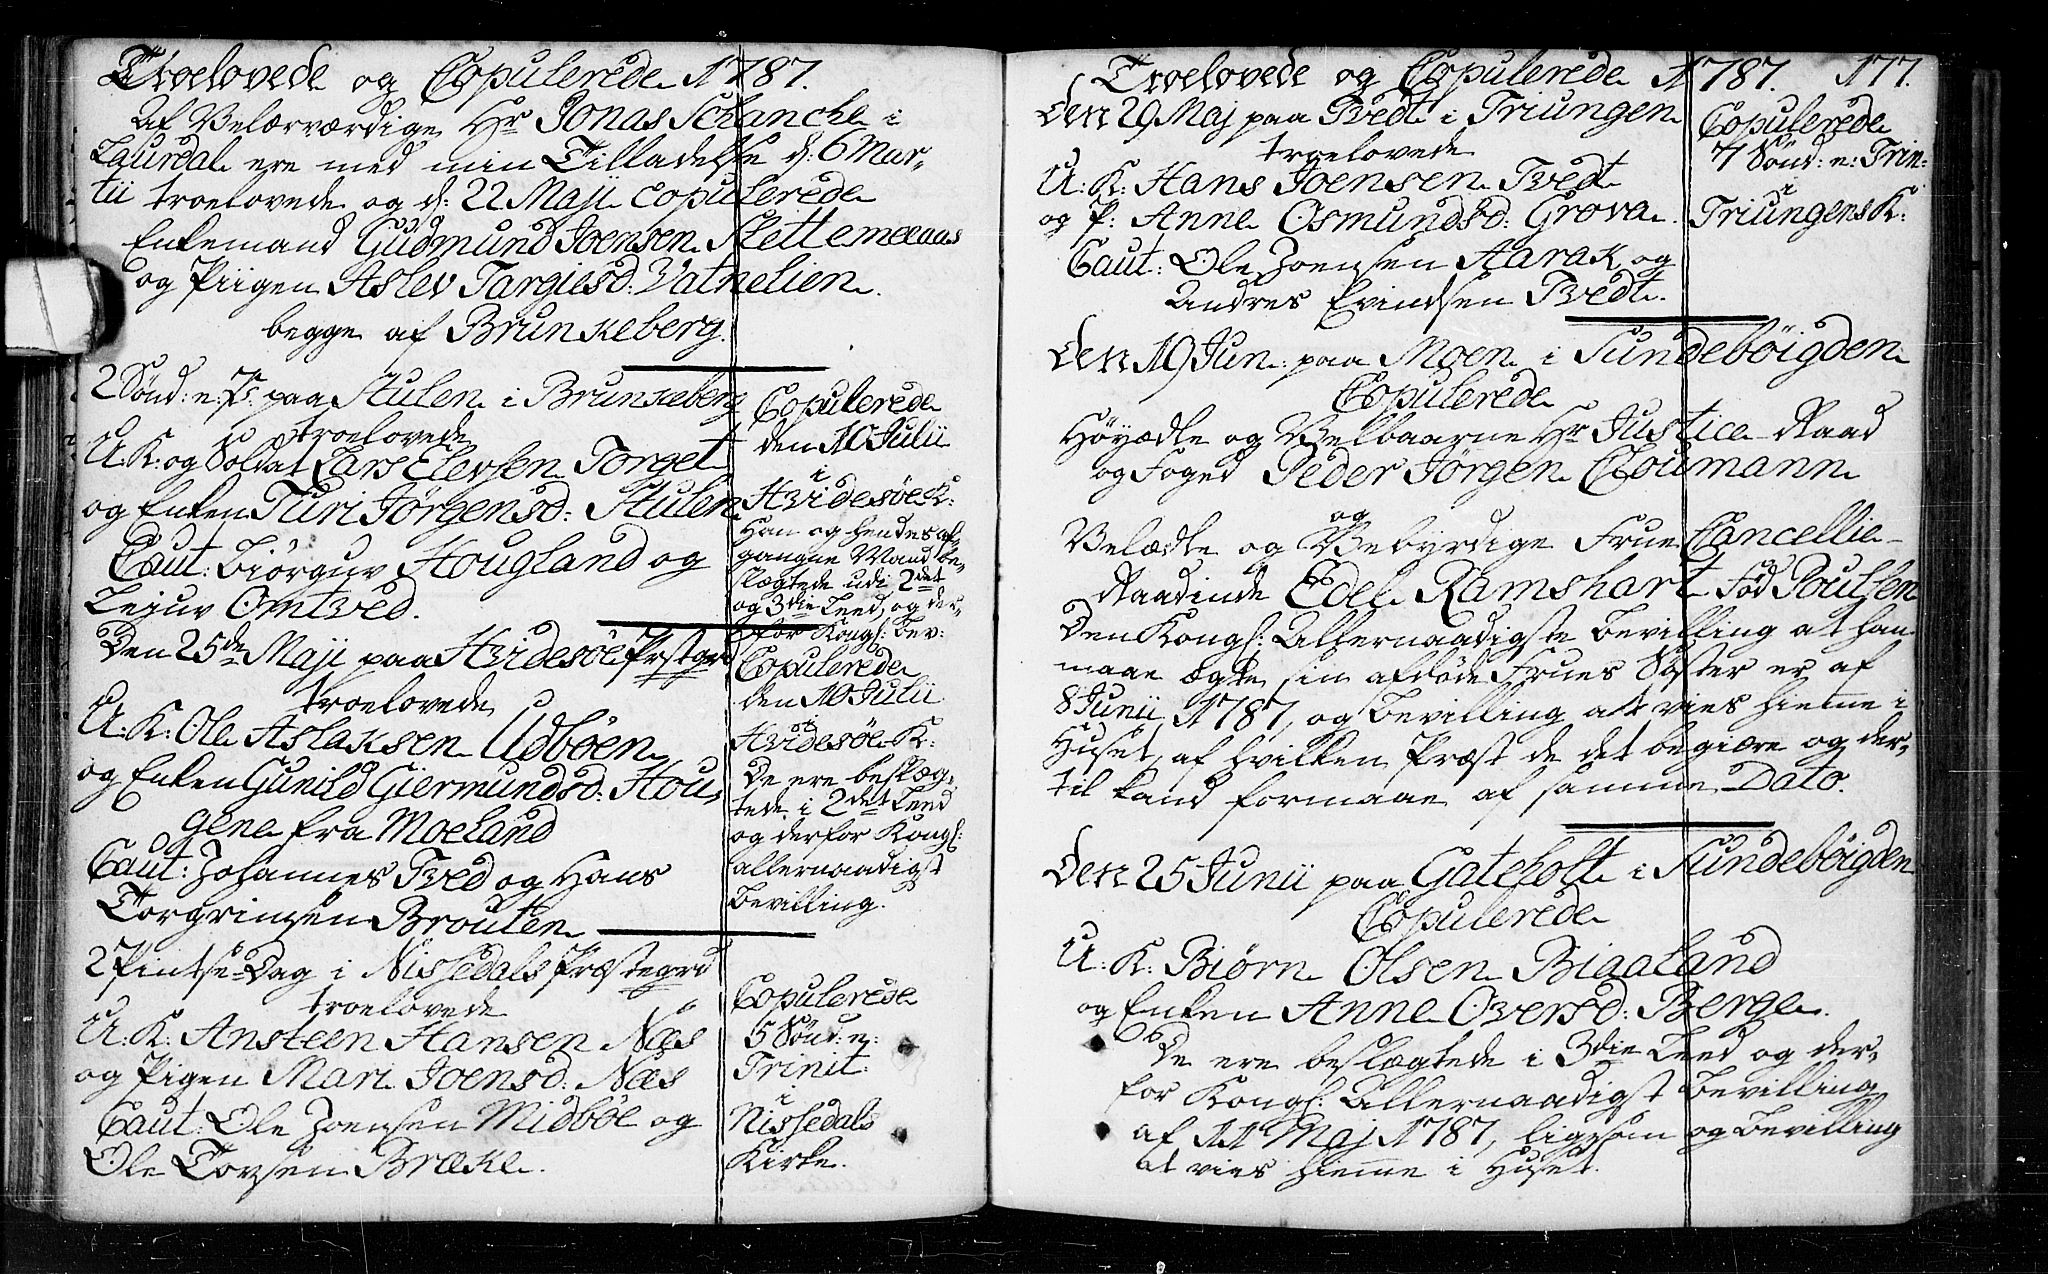 SAKO, Kviteseid kirkebøker, F/Fa/L0003: Parish register (official) no. I 3, 1787-1799, p. 177